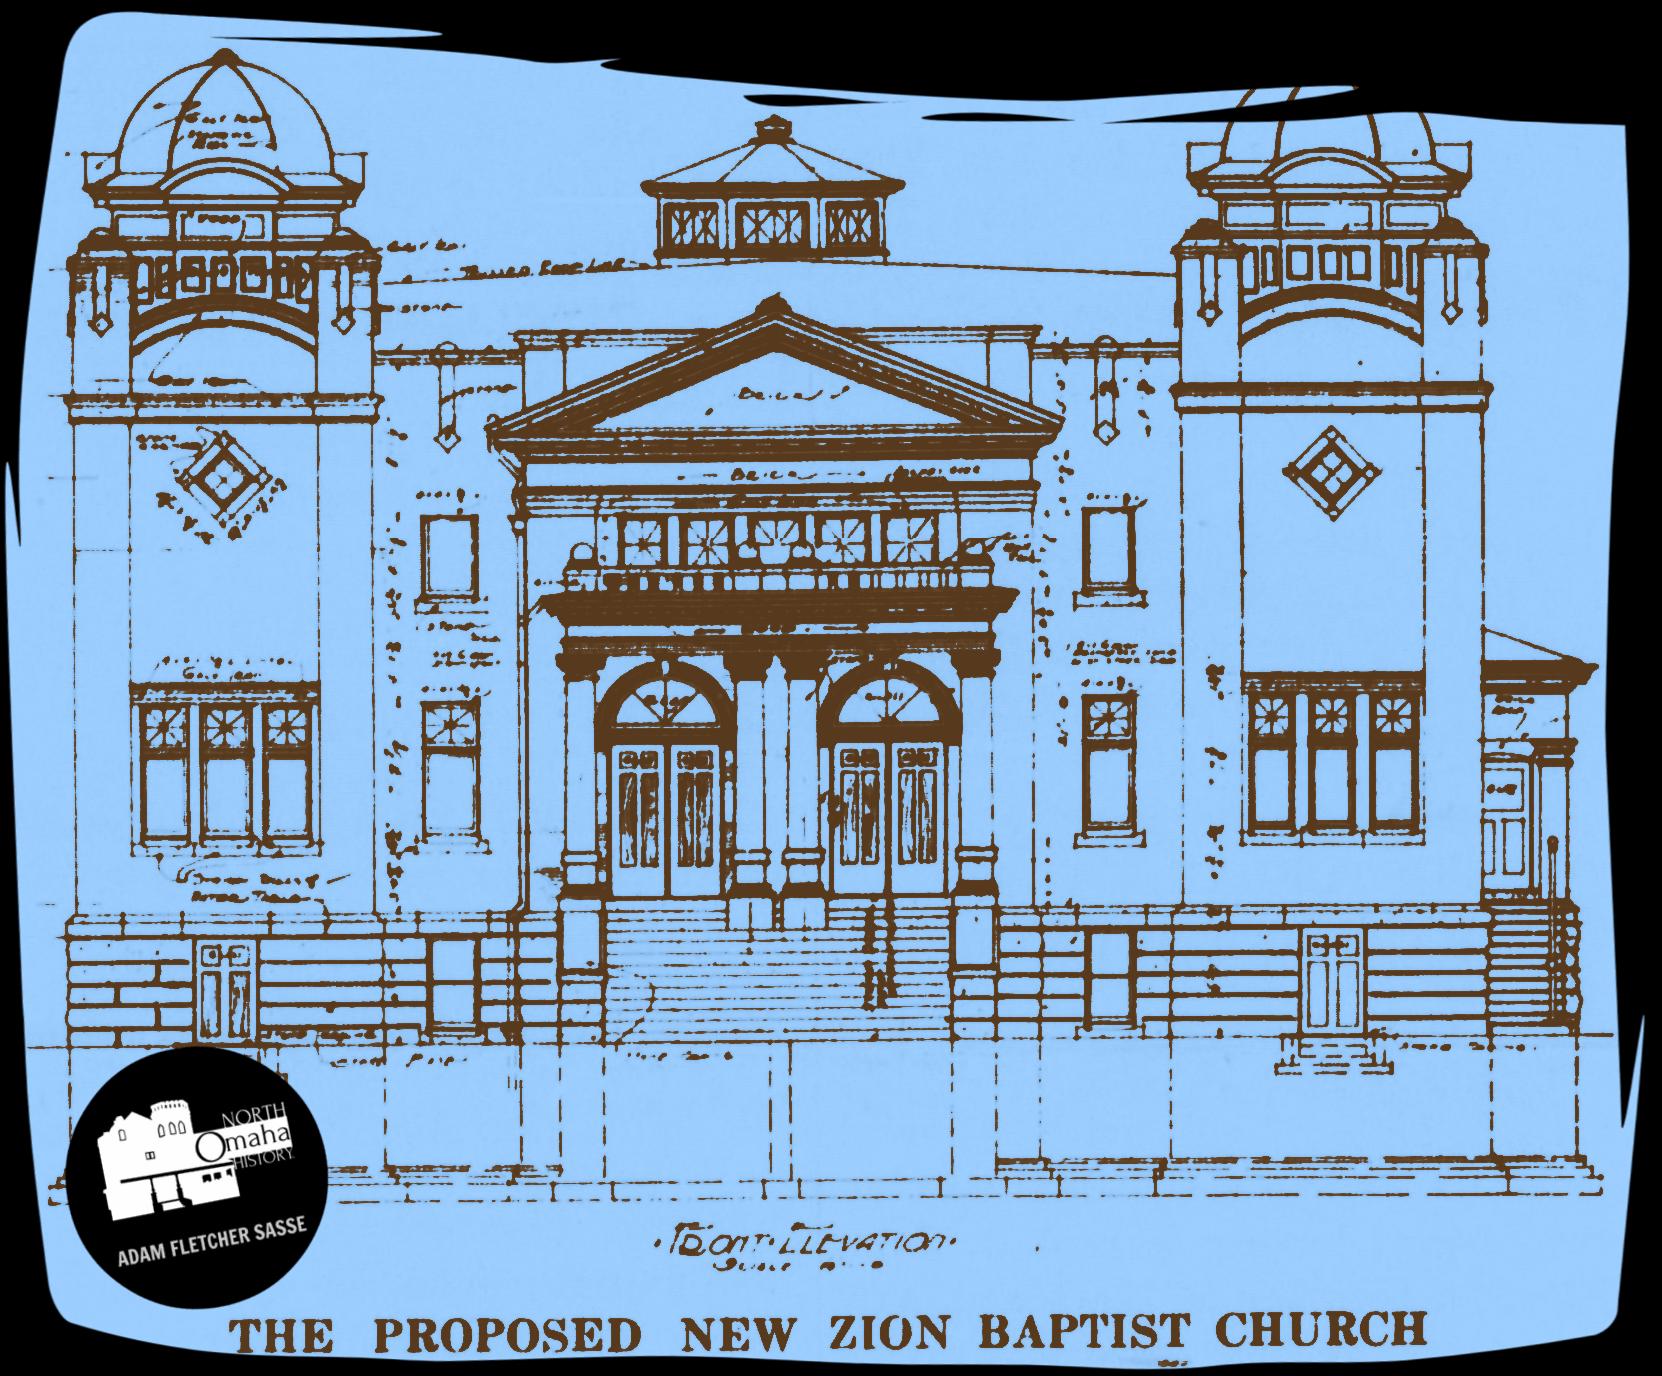 Zion Baptist Church in North Omaha, Nebraska